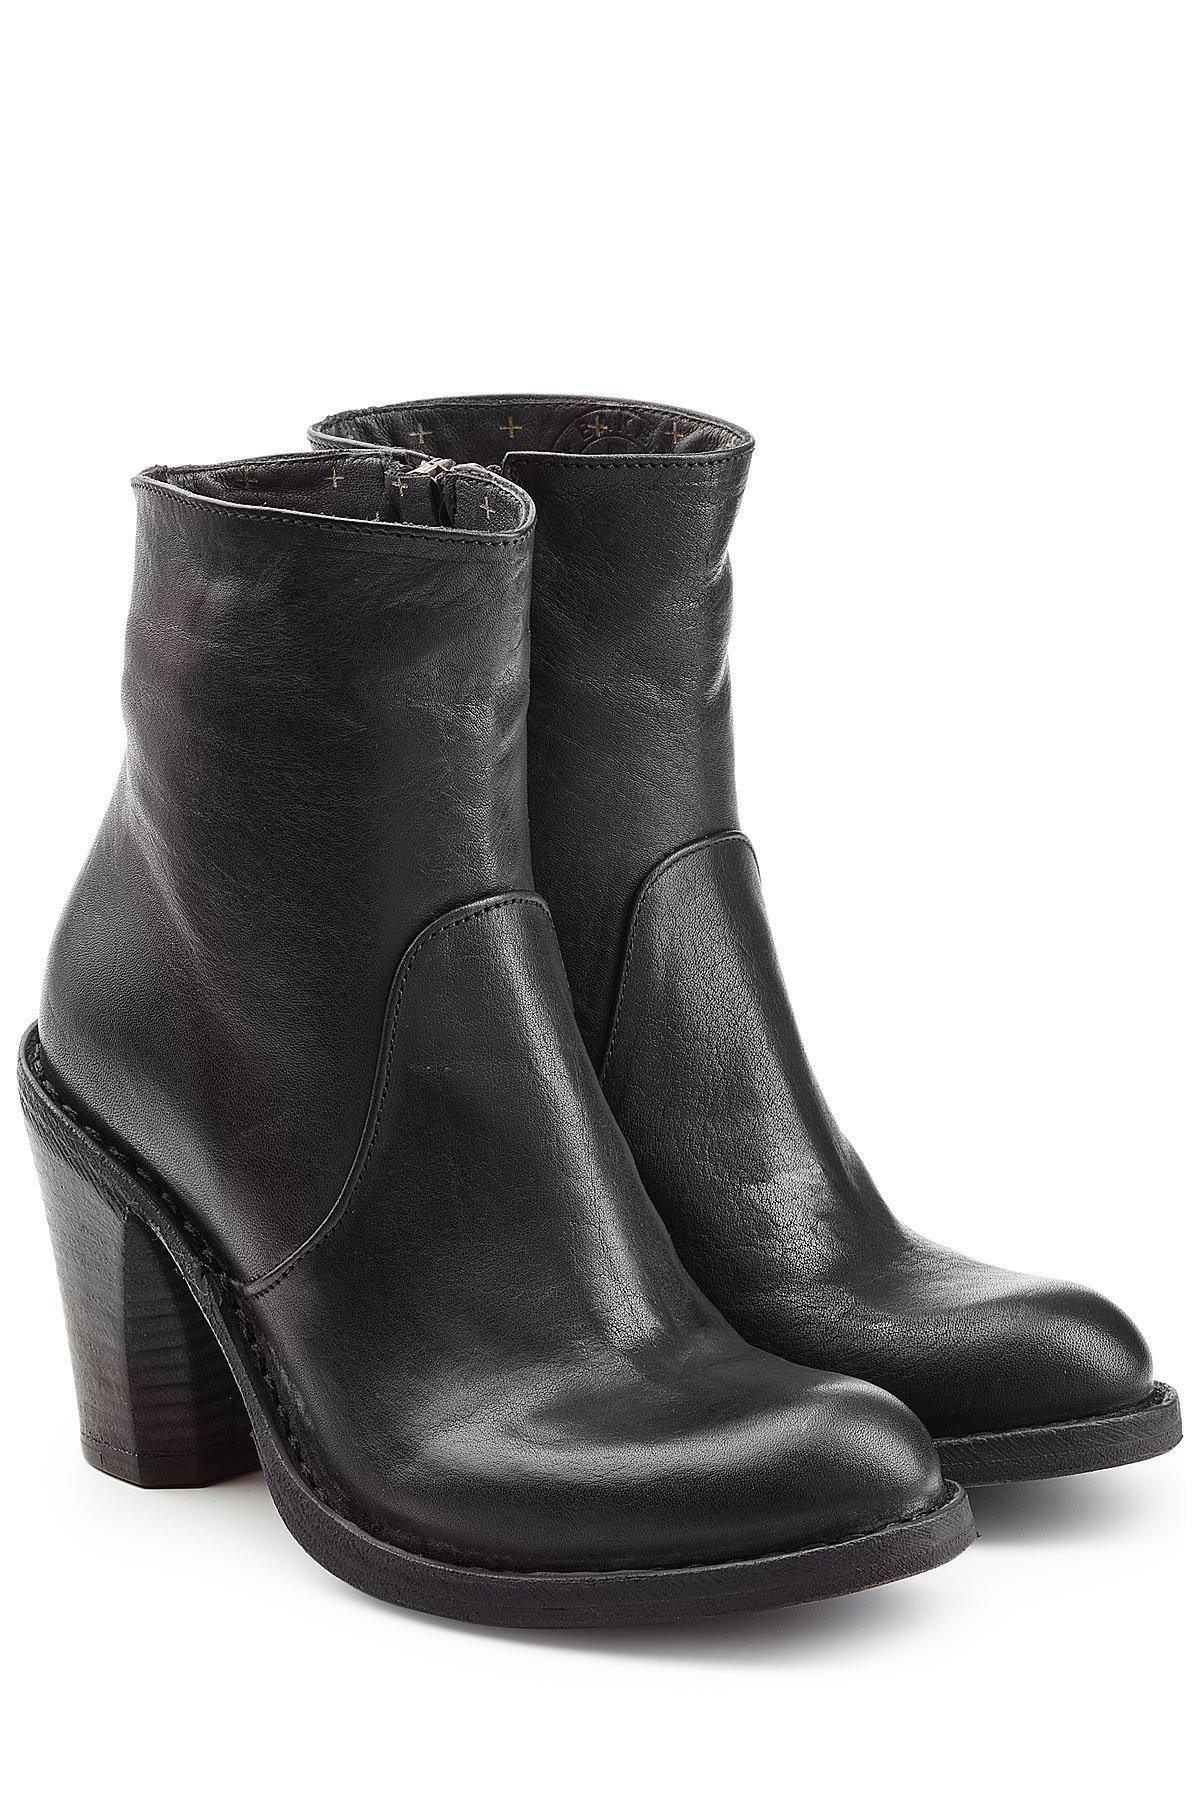 Robert Clergerie Suede Ankle Boots Gr. FR 40 XipnxXcoq